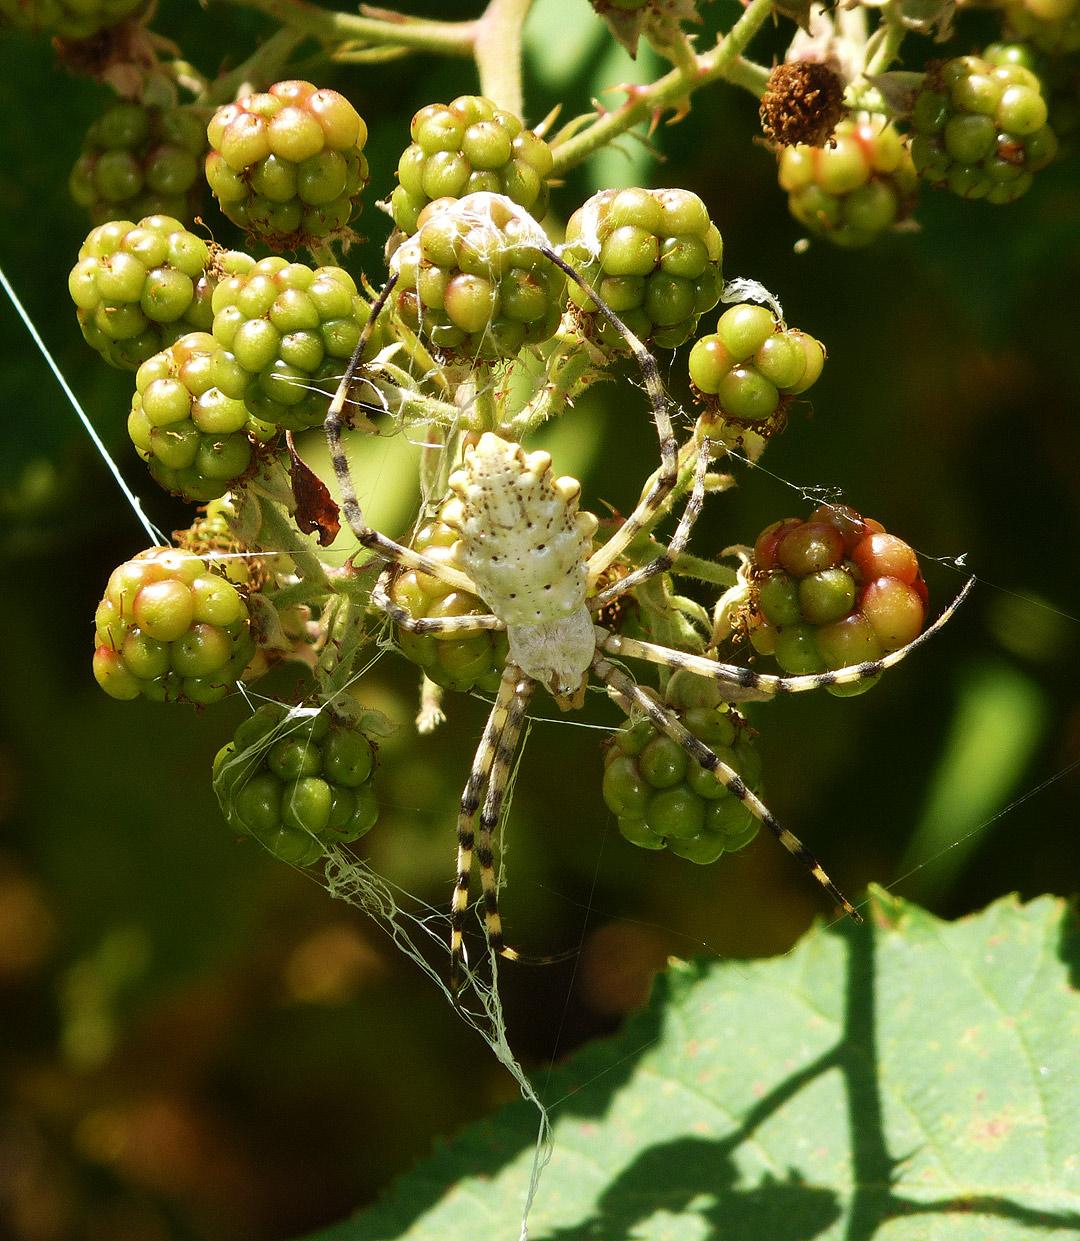 The spider Argiope lobata is making catching web by EldarZakirov